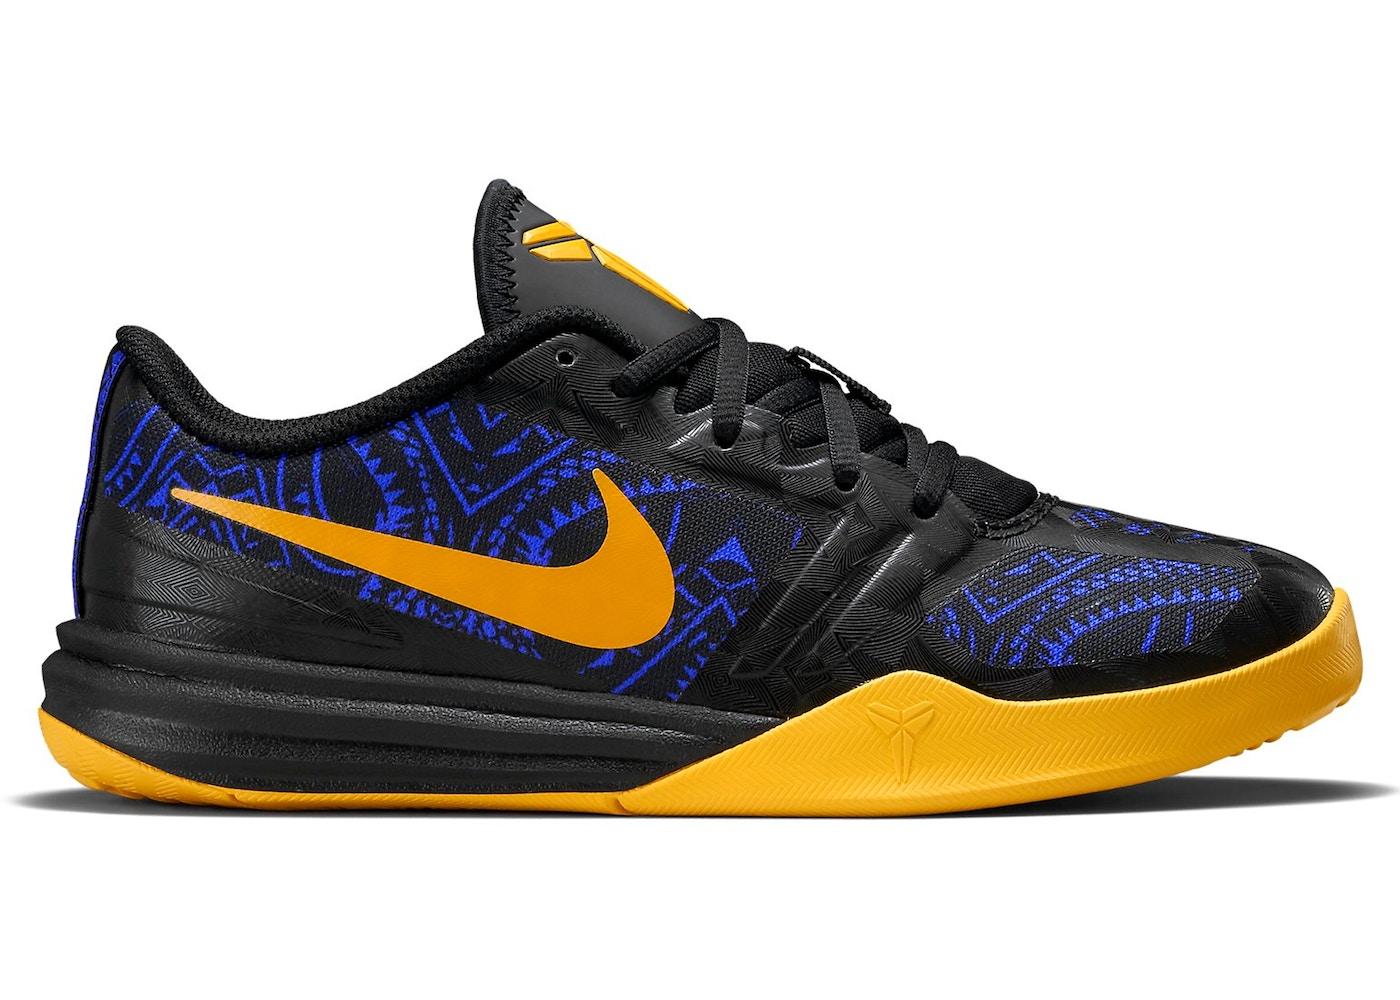 8e8641c818d Buy Nike Kobe Other Shoes   Deadstock Sneakers